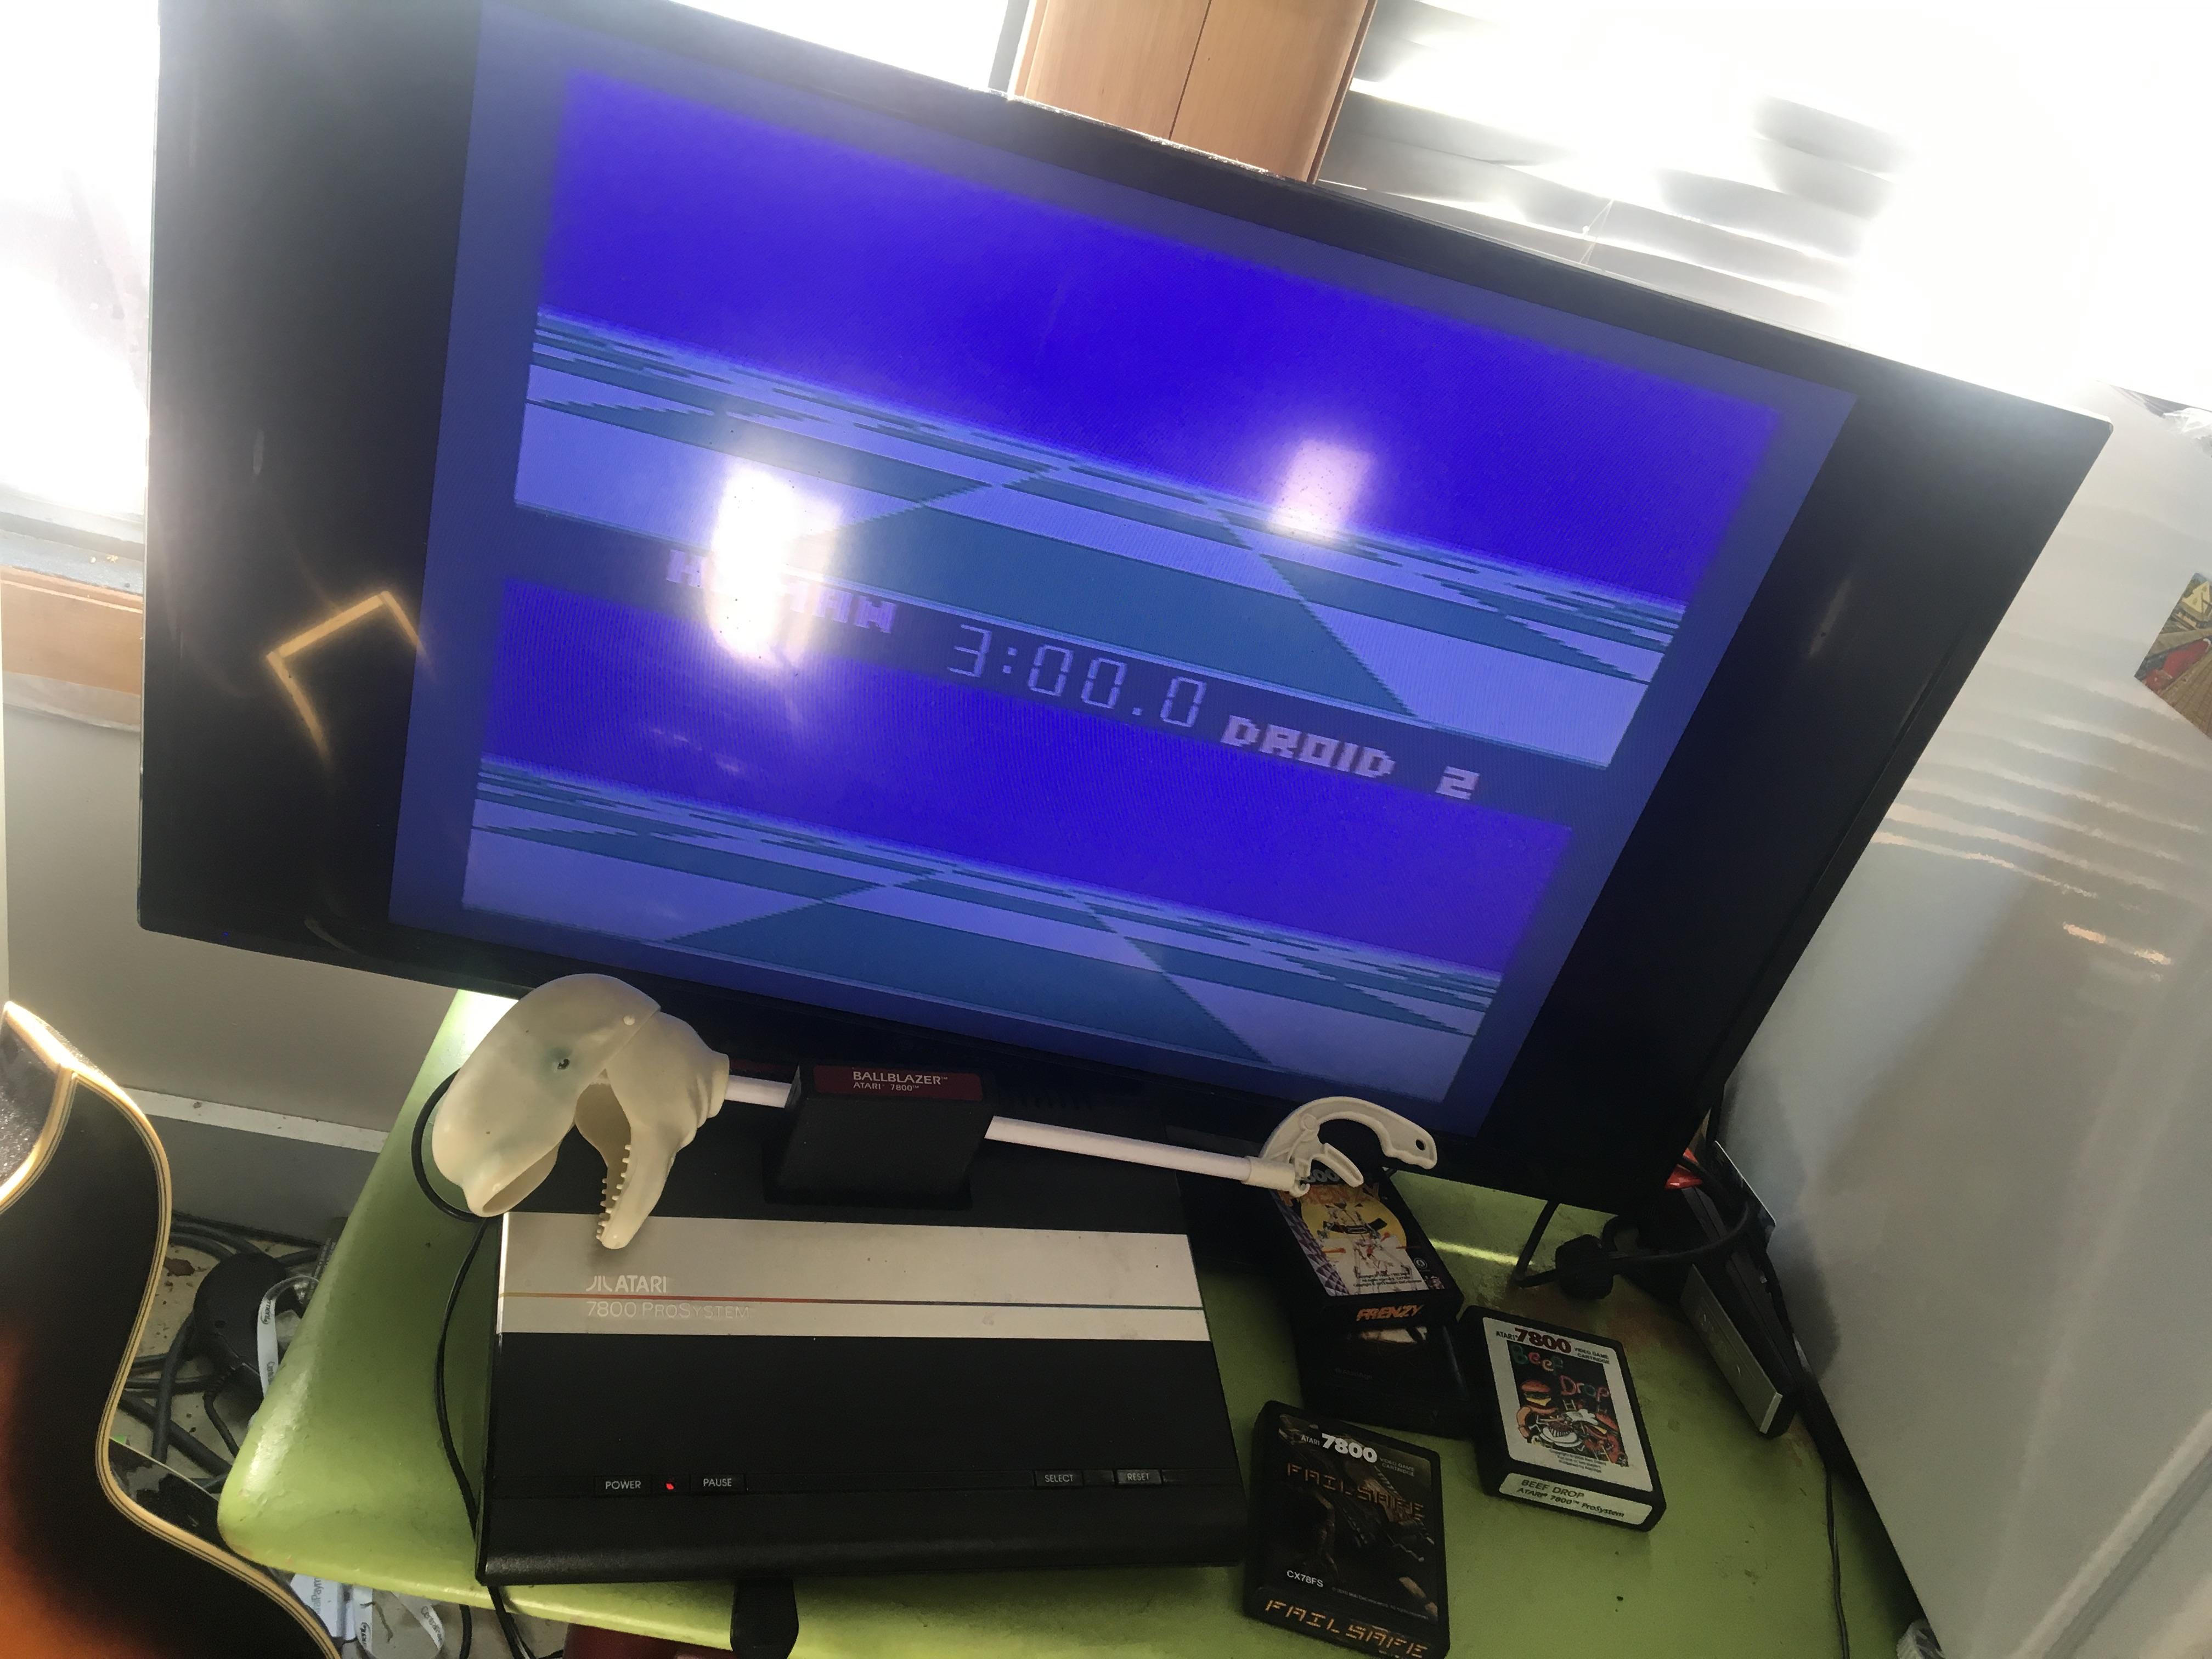 CousinVinnie: Ballblazer: Droid 2 / 3 minutes (Atari 7800) 10 points on 2017-11-26 09:44:53